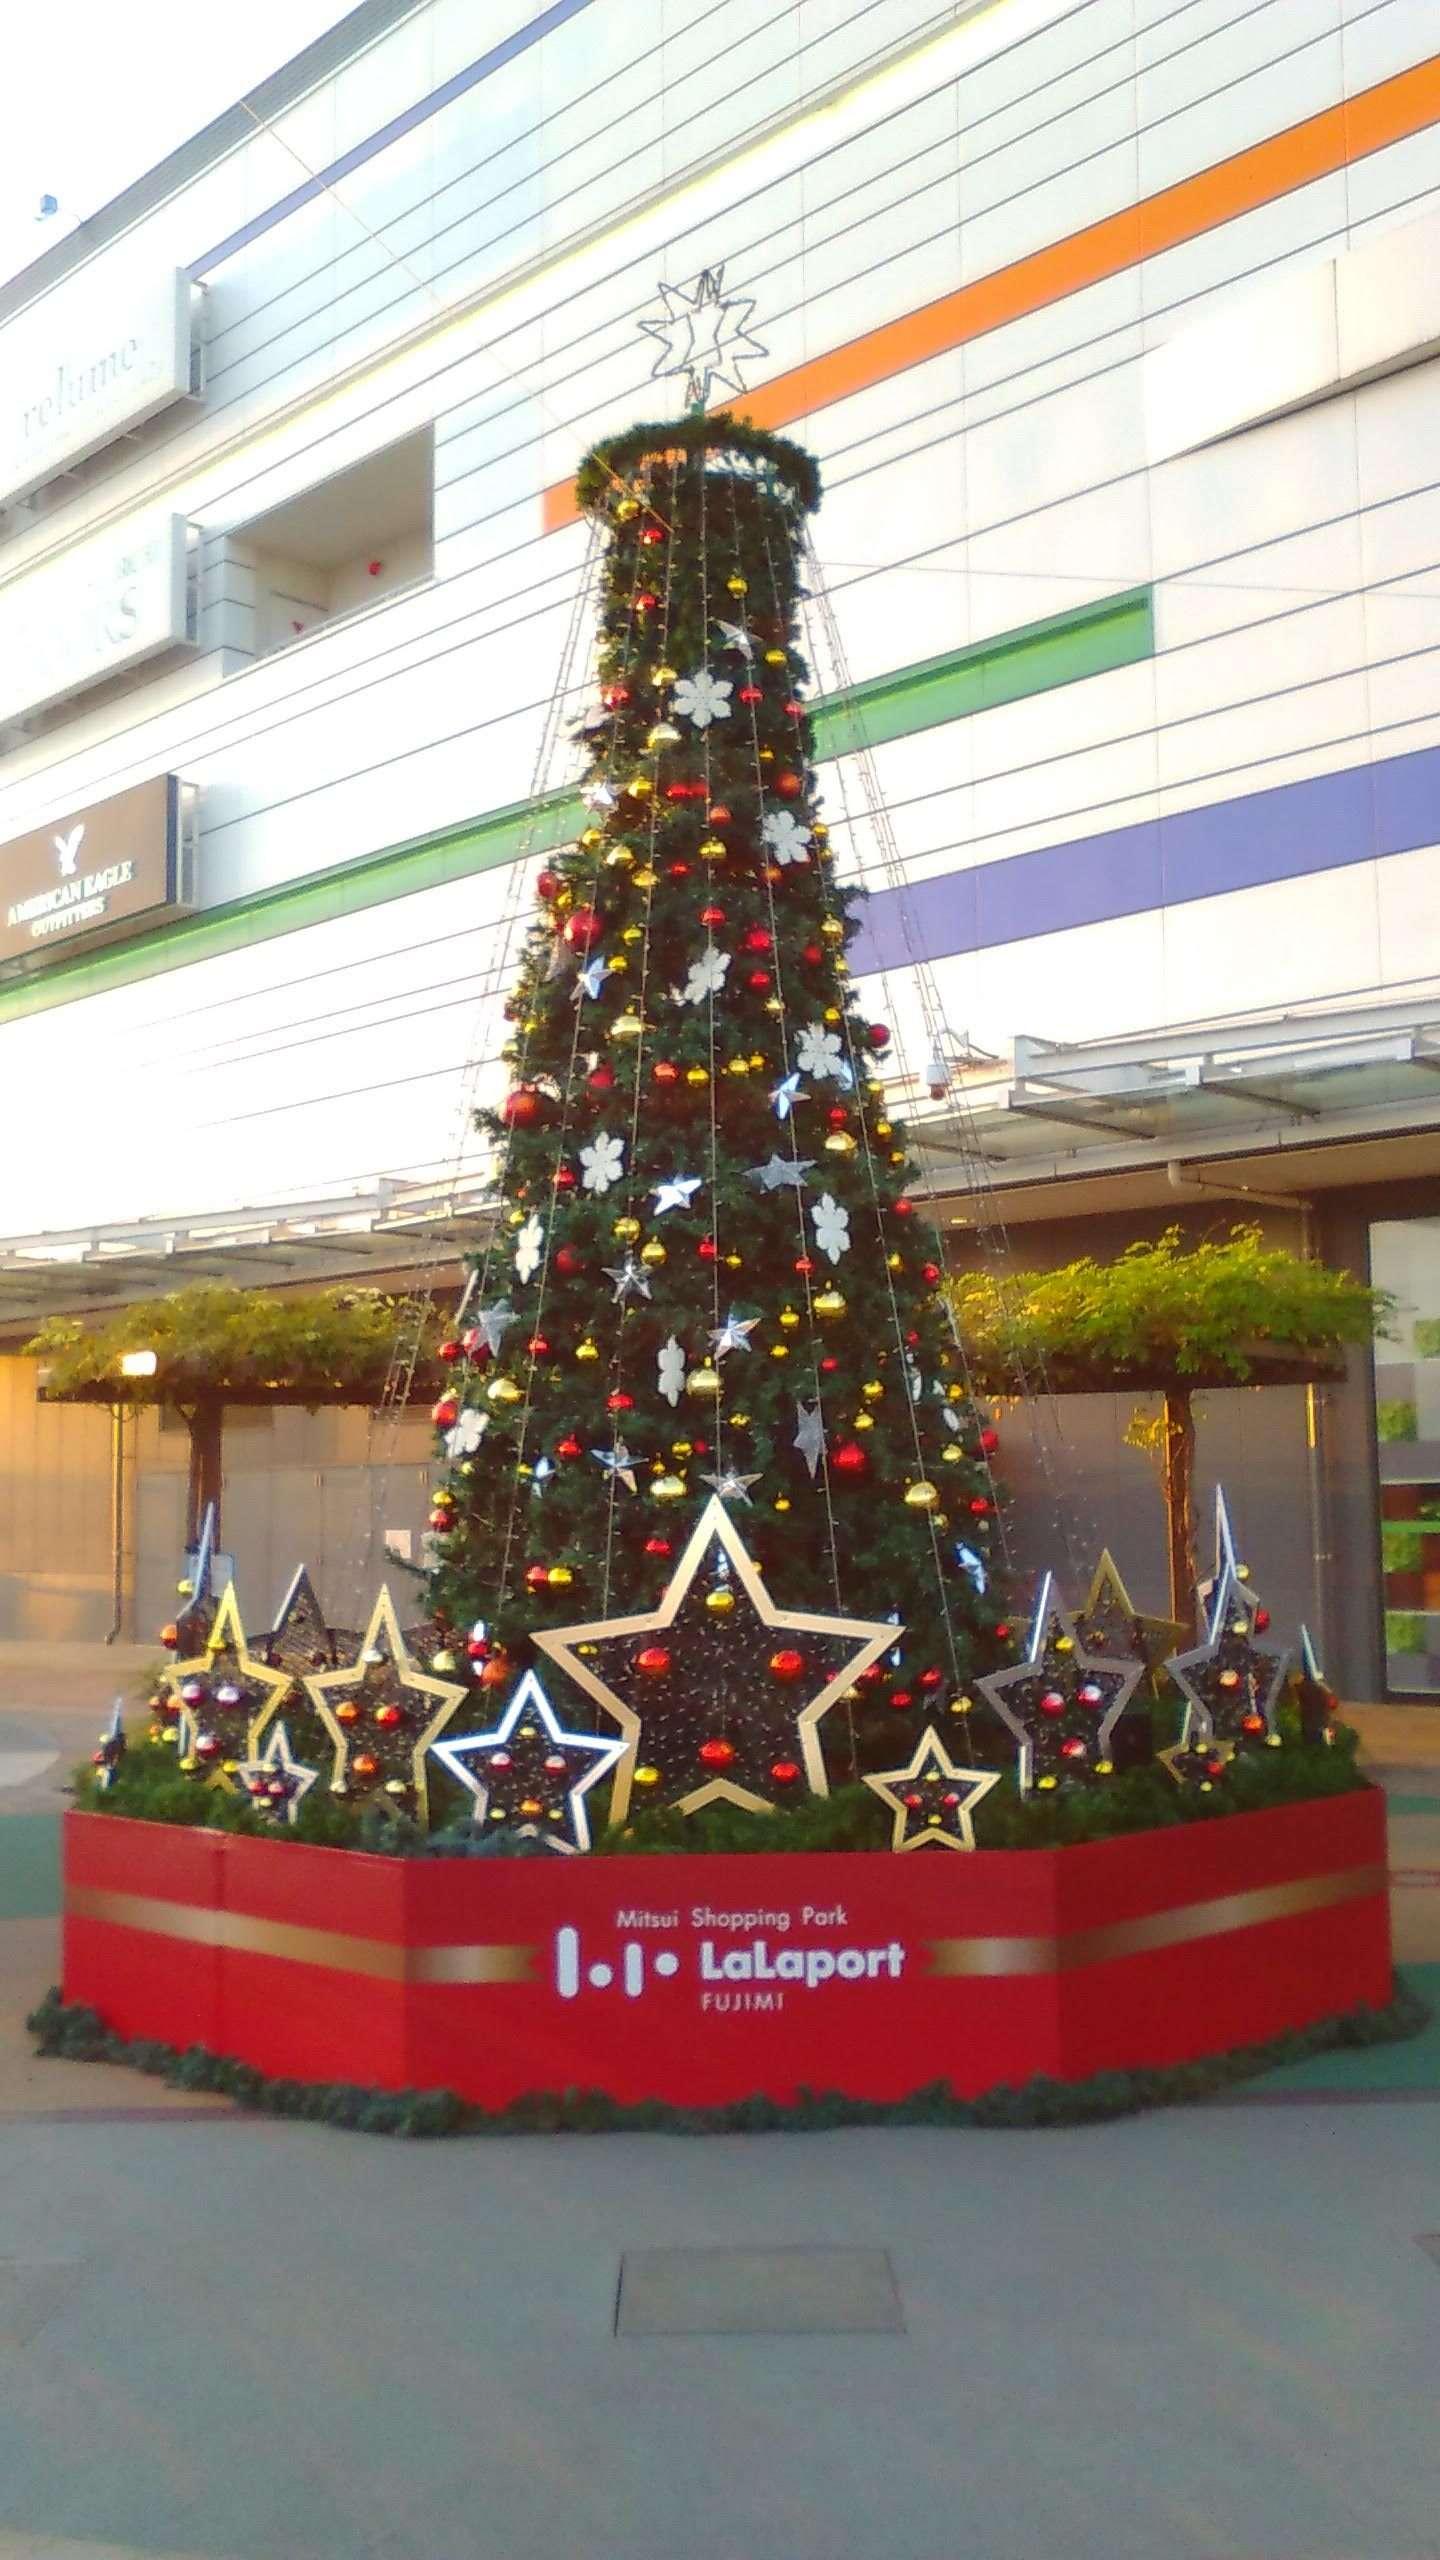 Santa Lalaport Fujimi Lego Santa